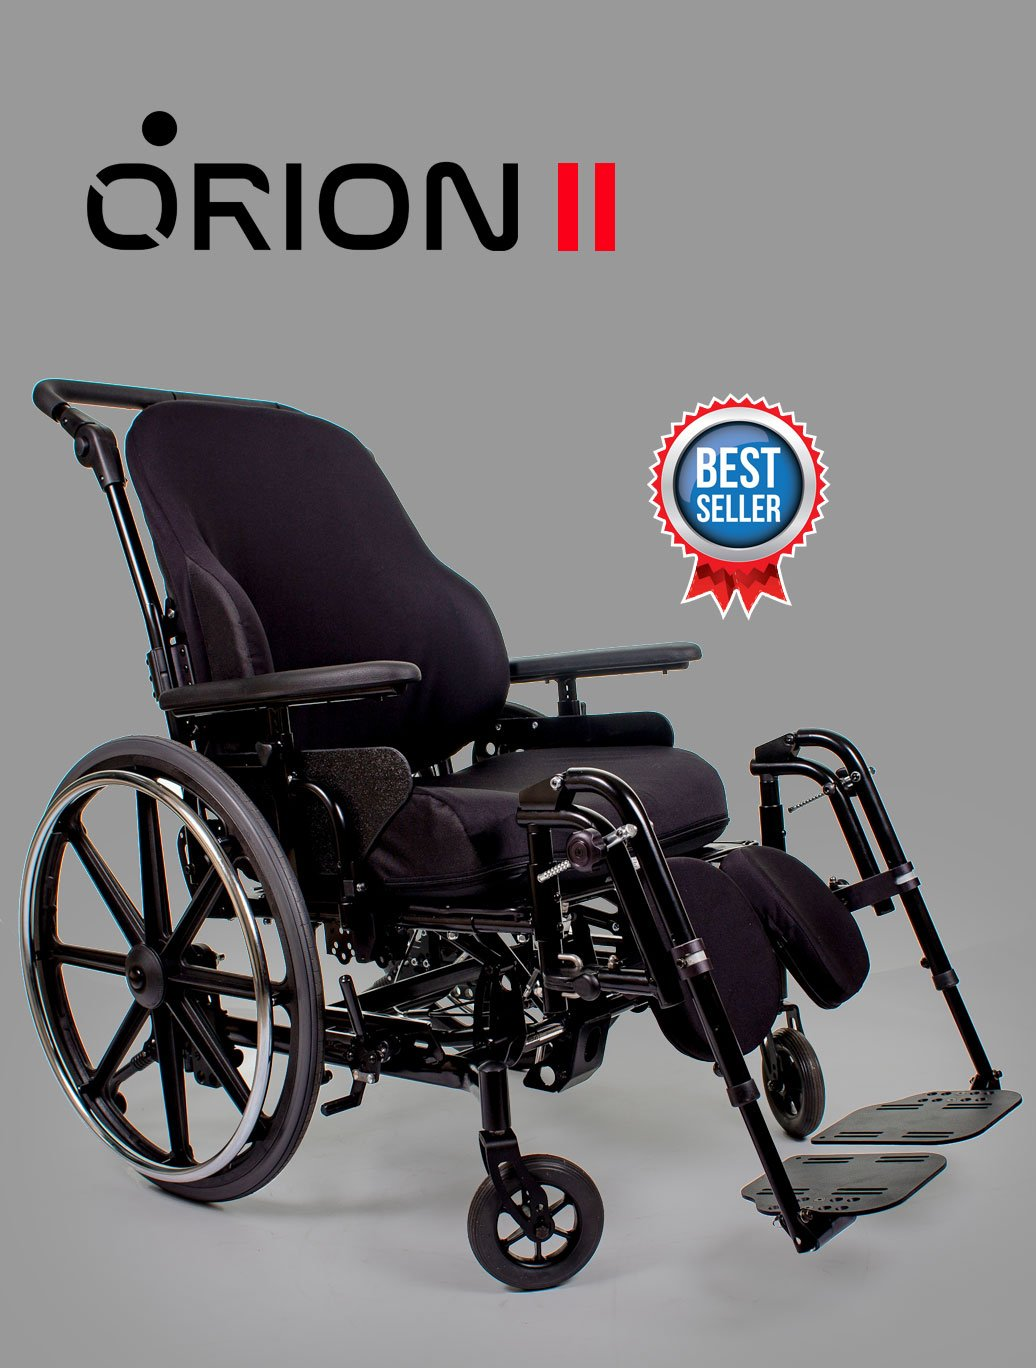 orion II wheelchair best seller